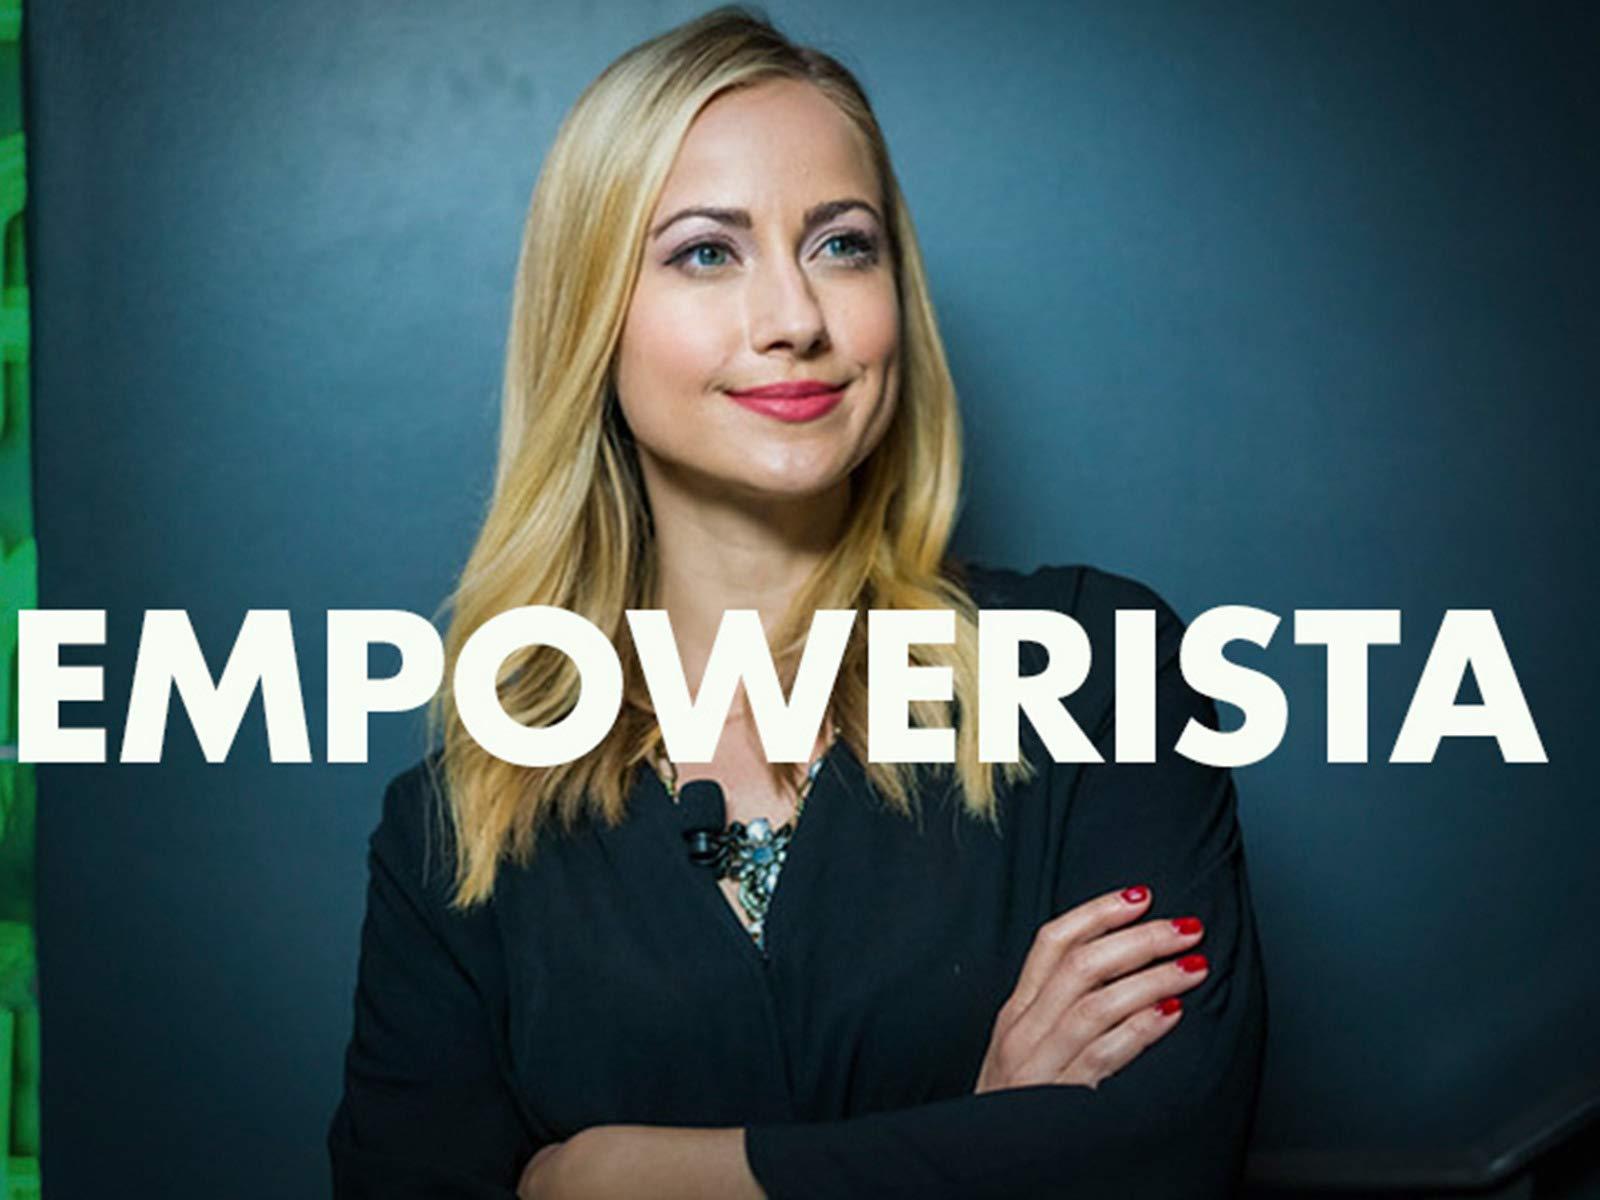 Empowerista - Season 1